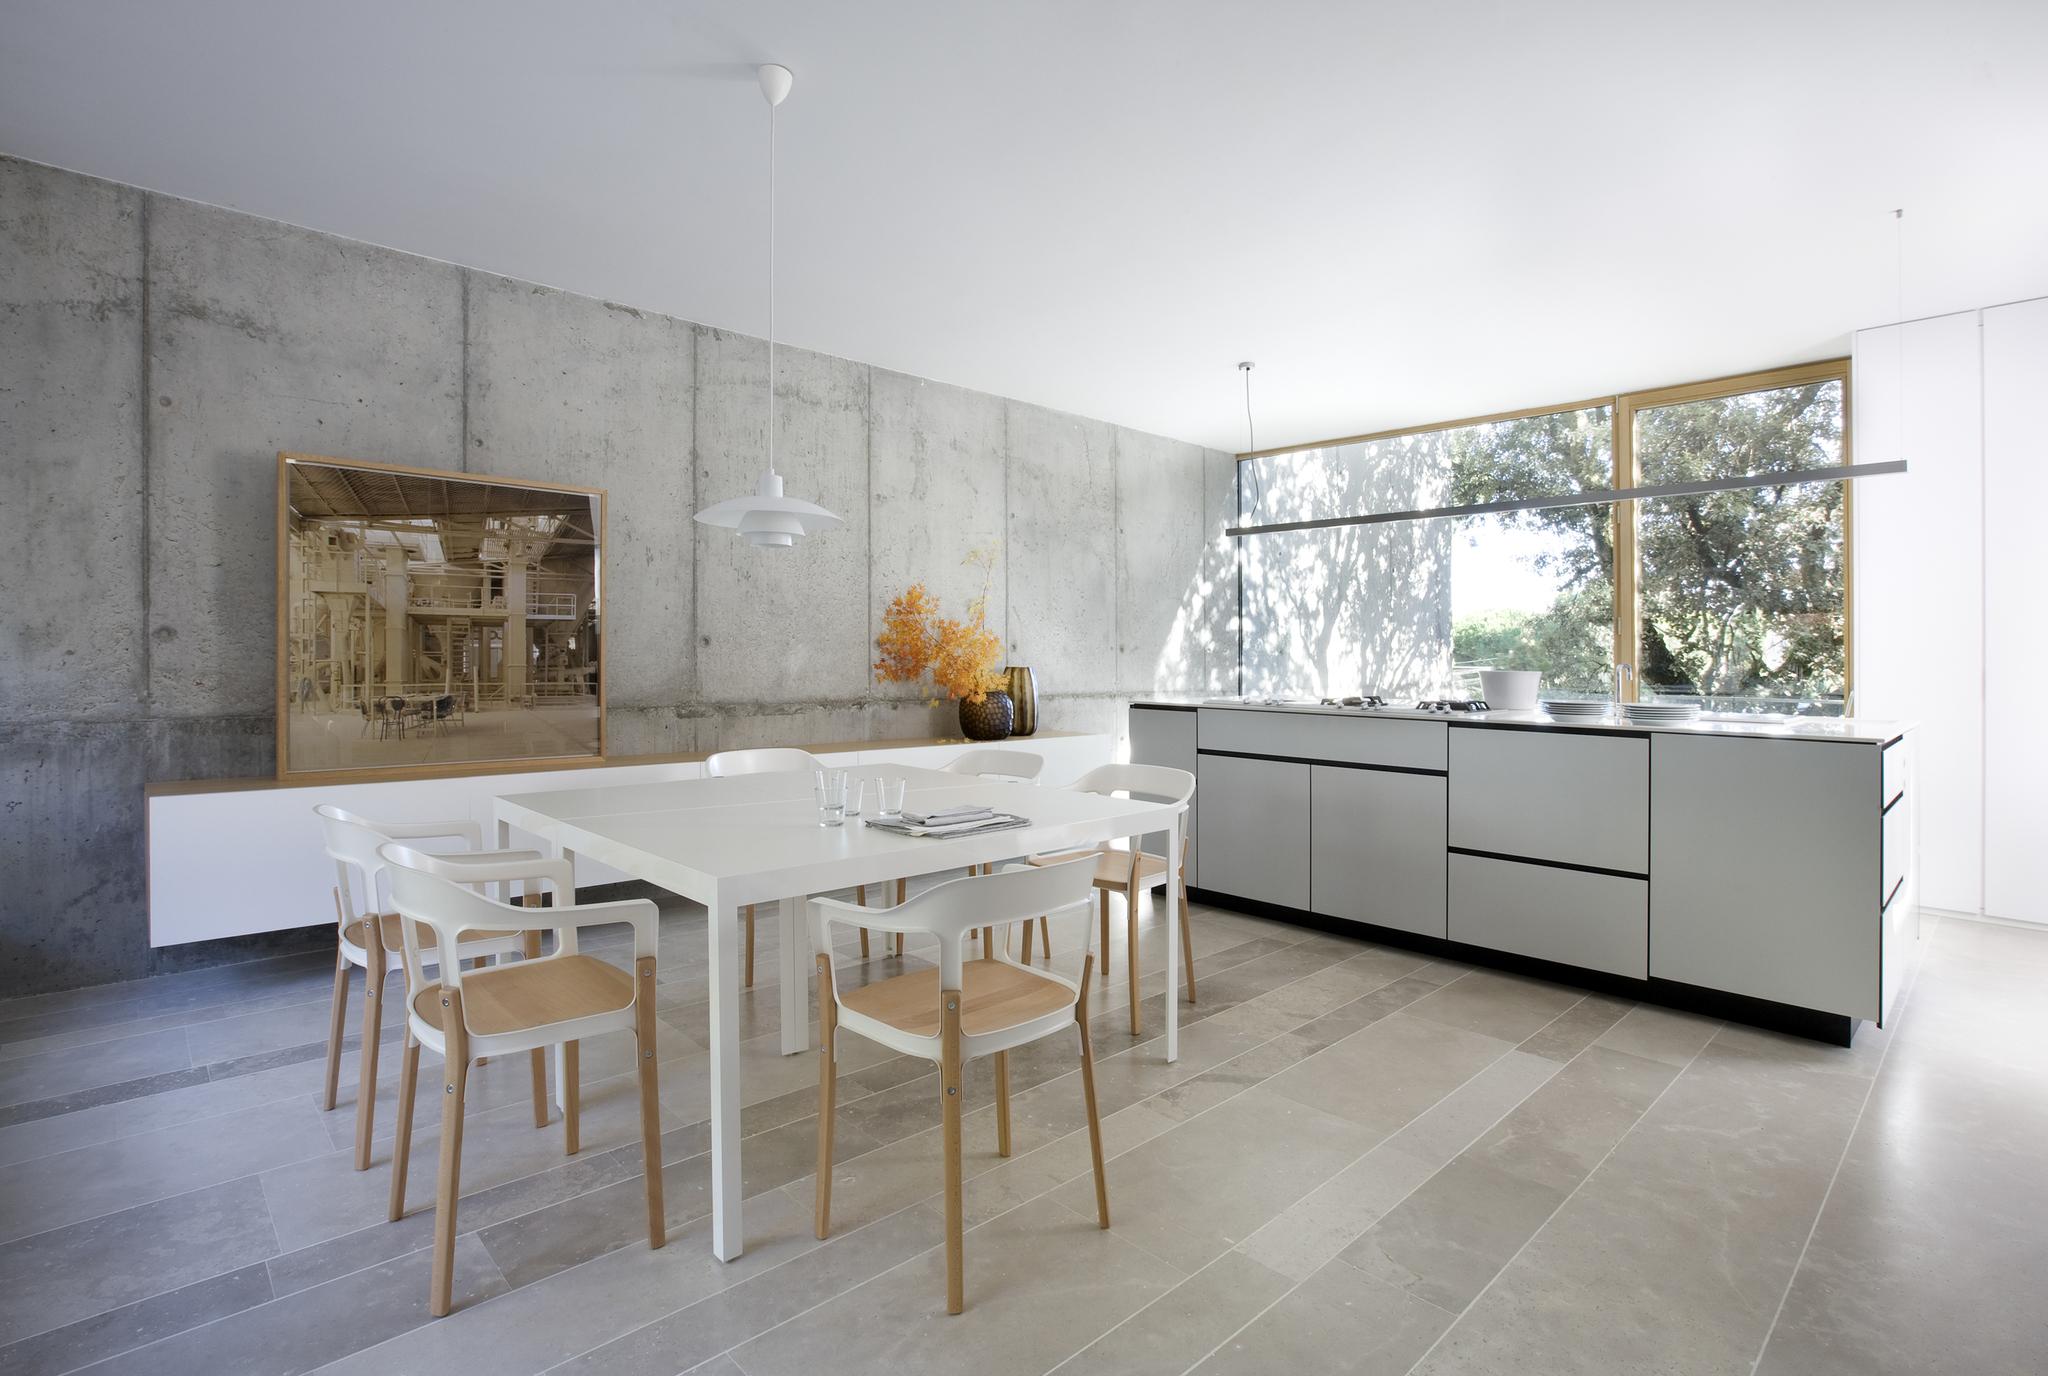 Diseño showroom ABATON con interiorsmo BATAVIA